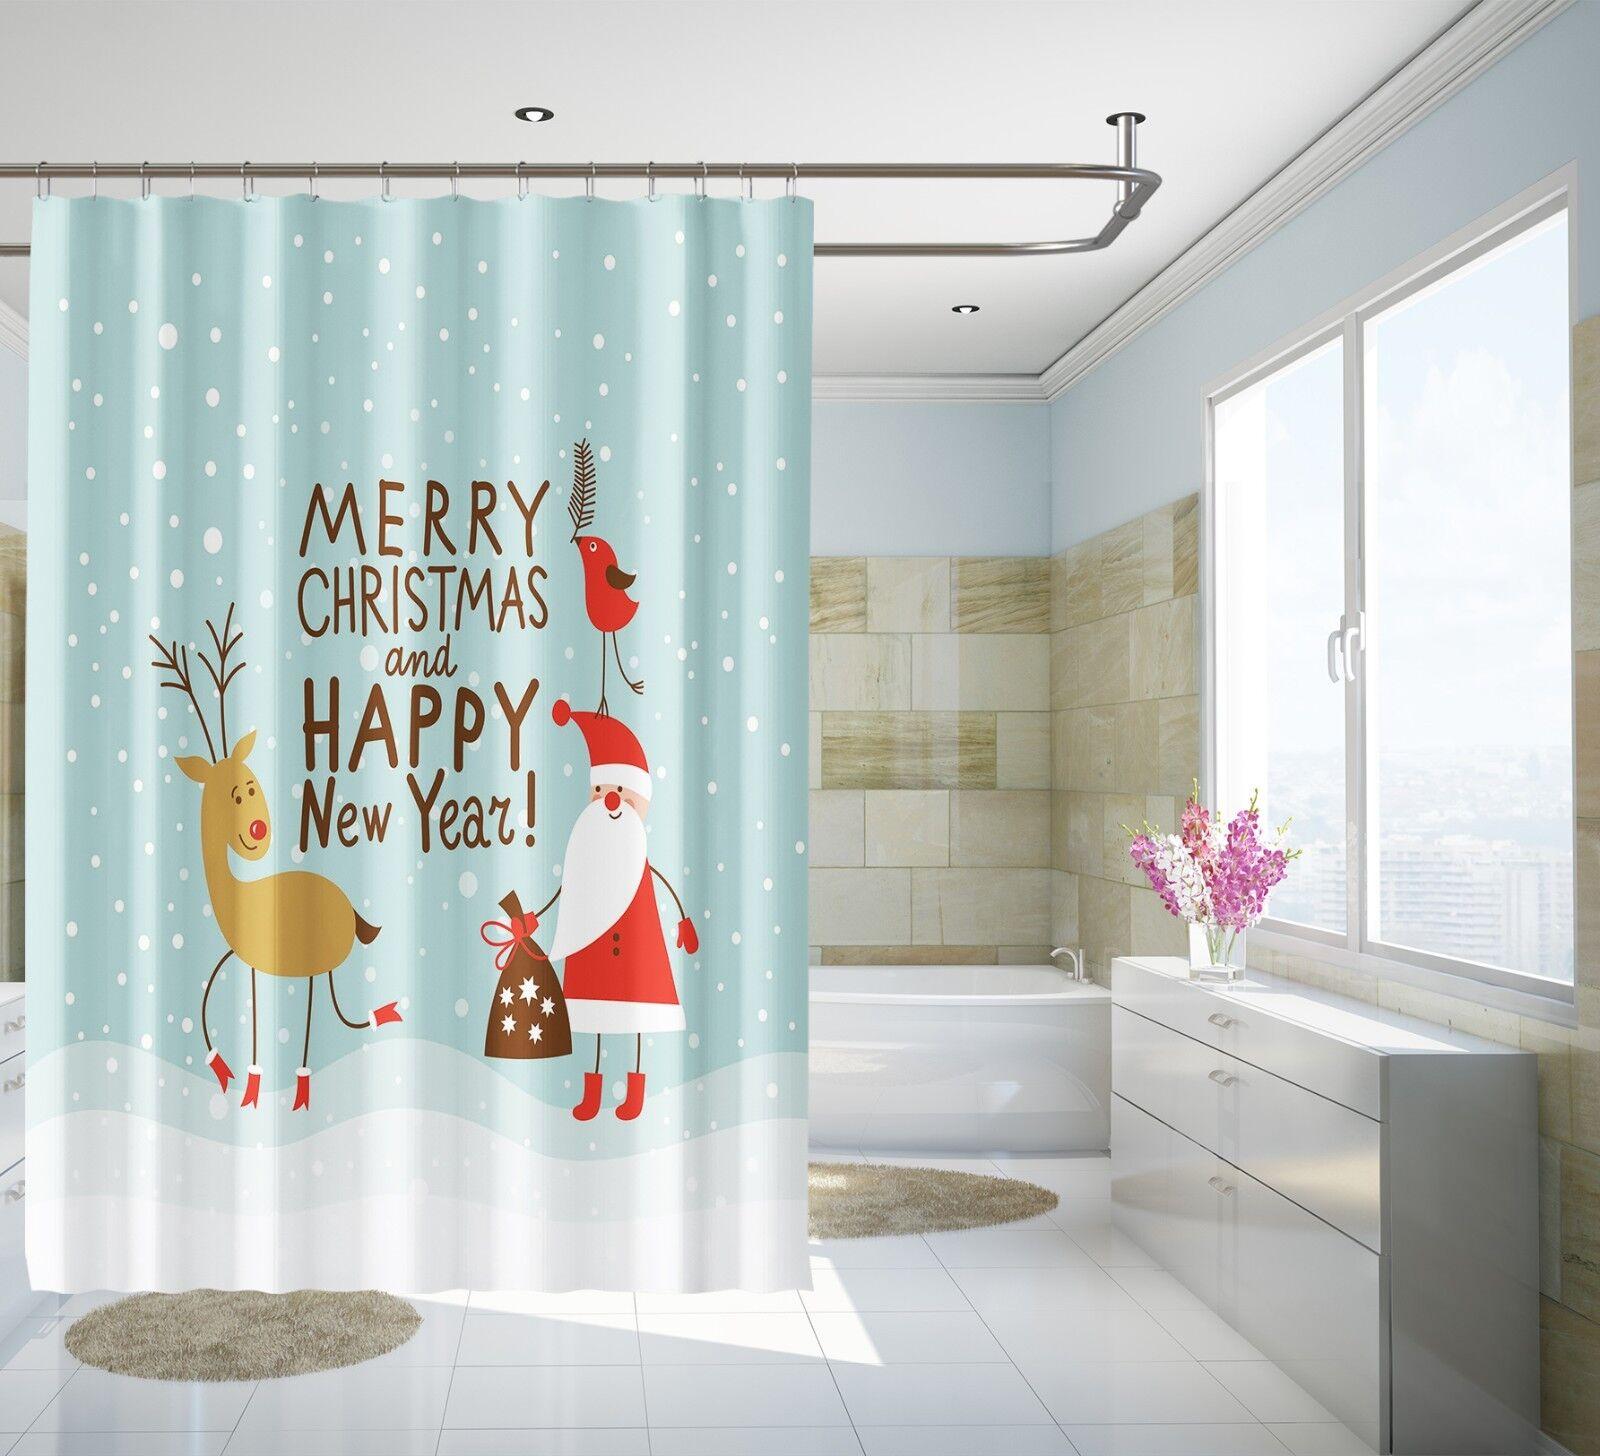 3D Santa Claus 341 Shower Curtain Waterproof Fiber Bathroom Home Windows Toilet